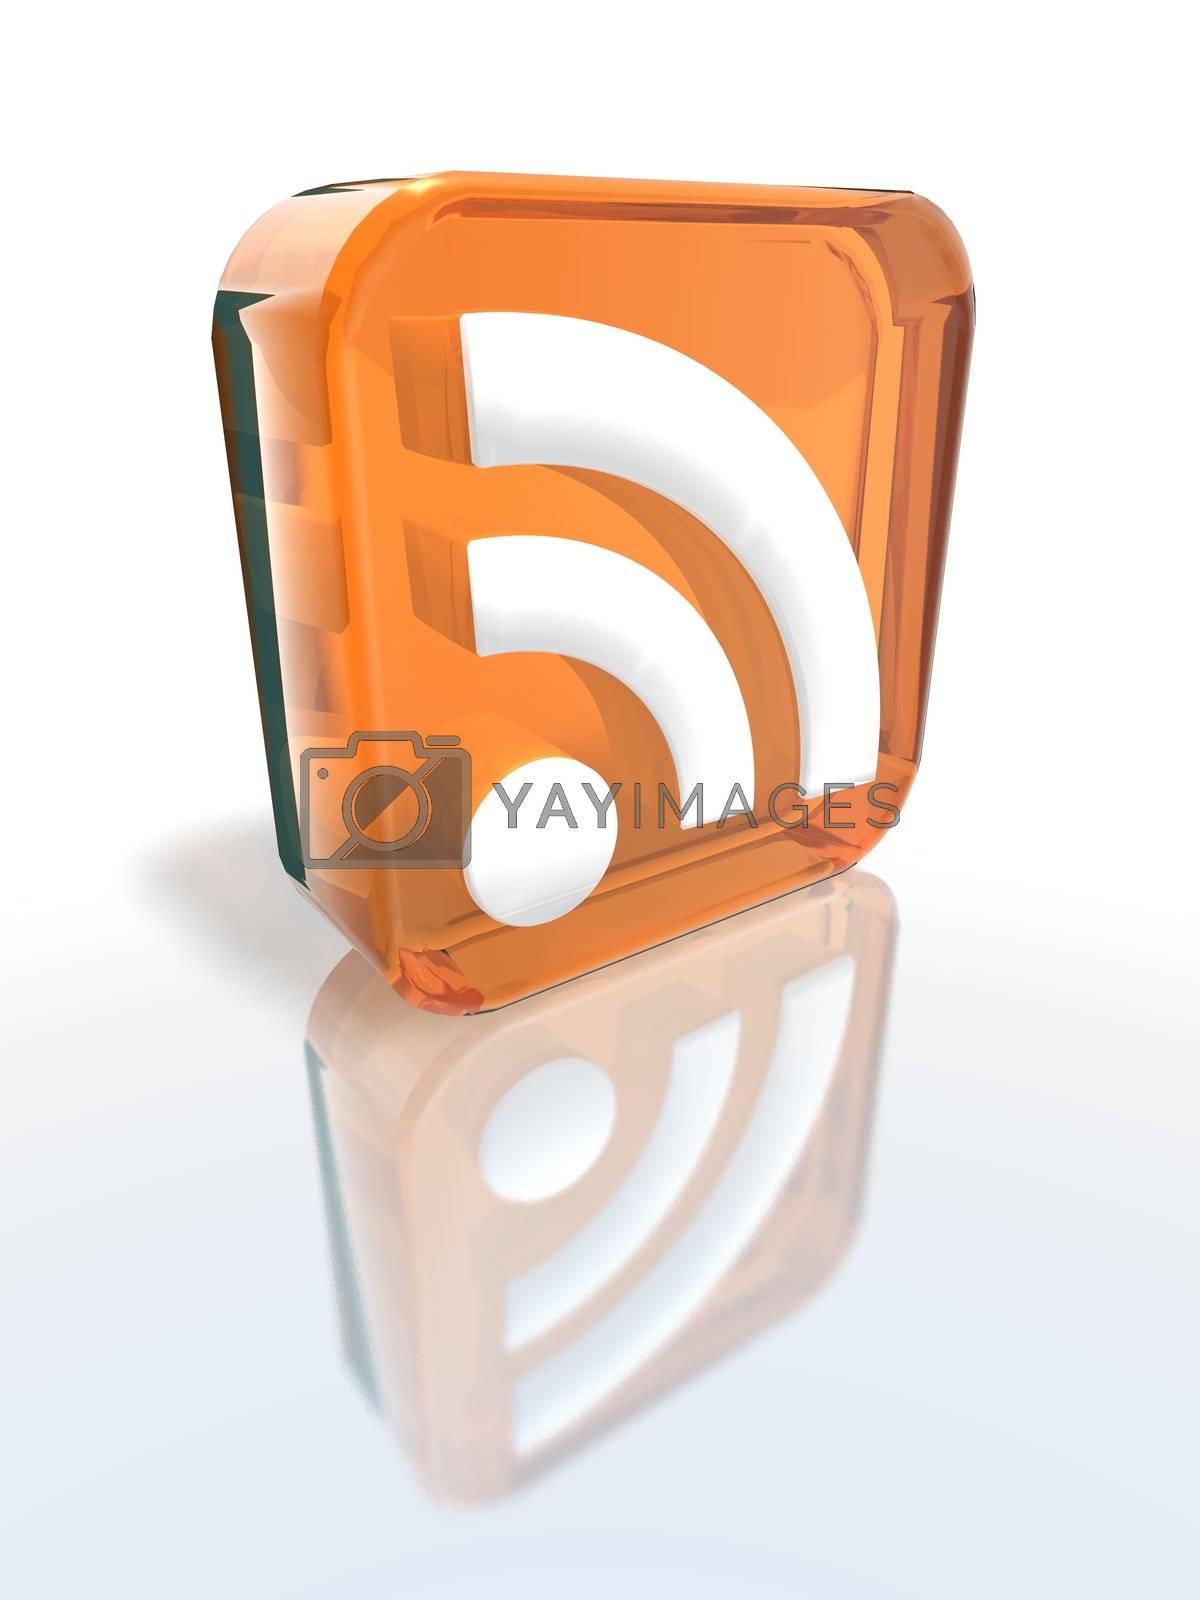 a 3d render of an orange RSS sign